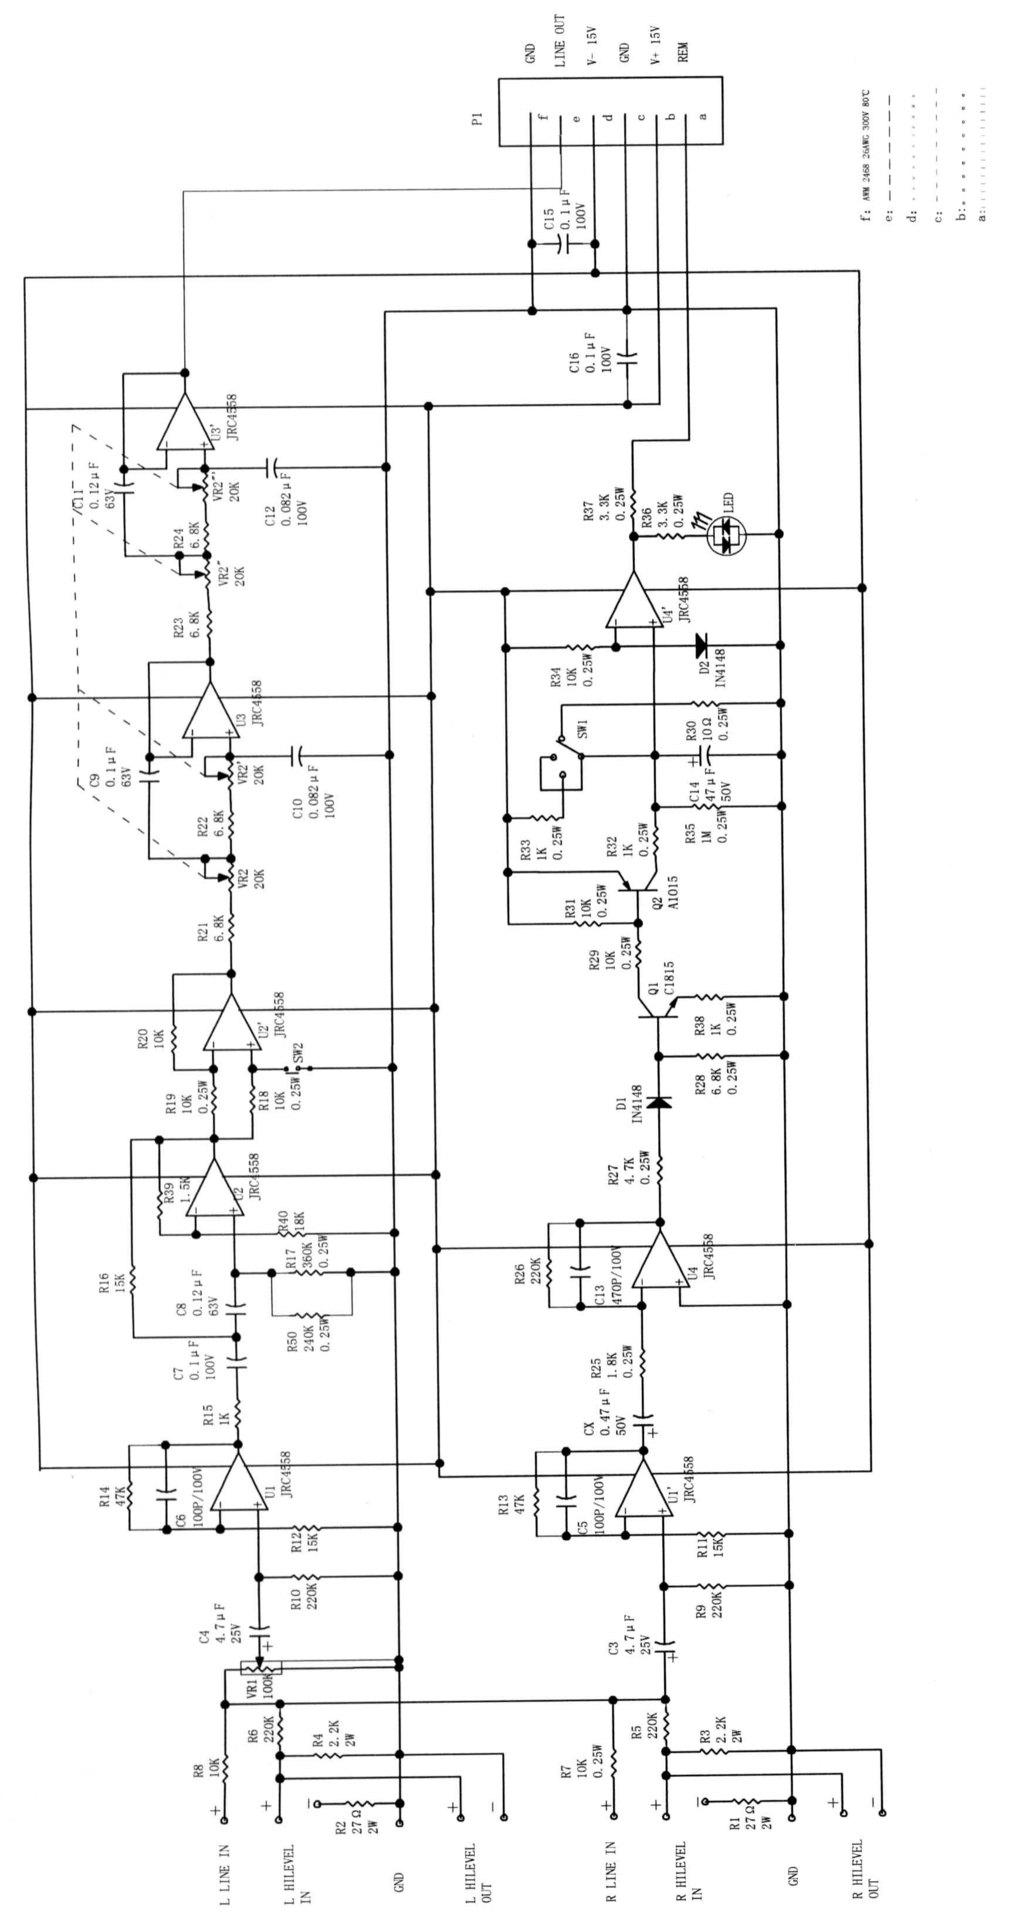 Großzügig 480 Bis 120 Schaltplan Galerie - Schaltplan Serie Circuit ...